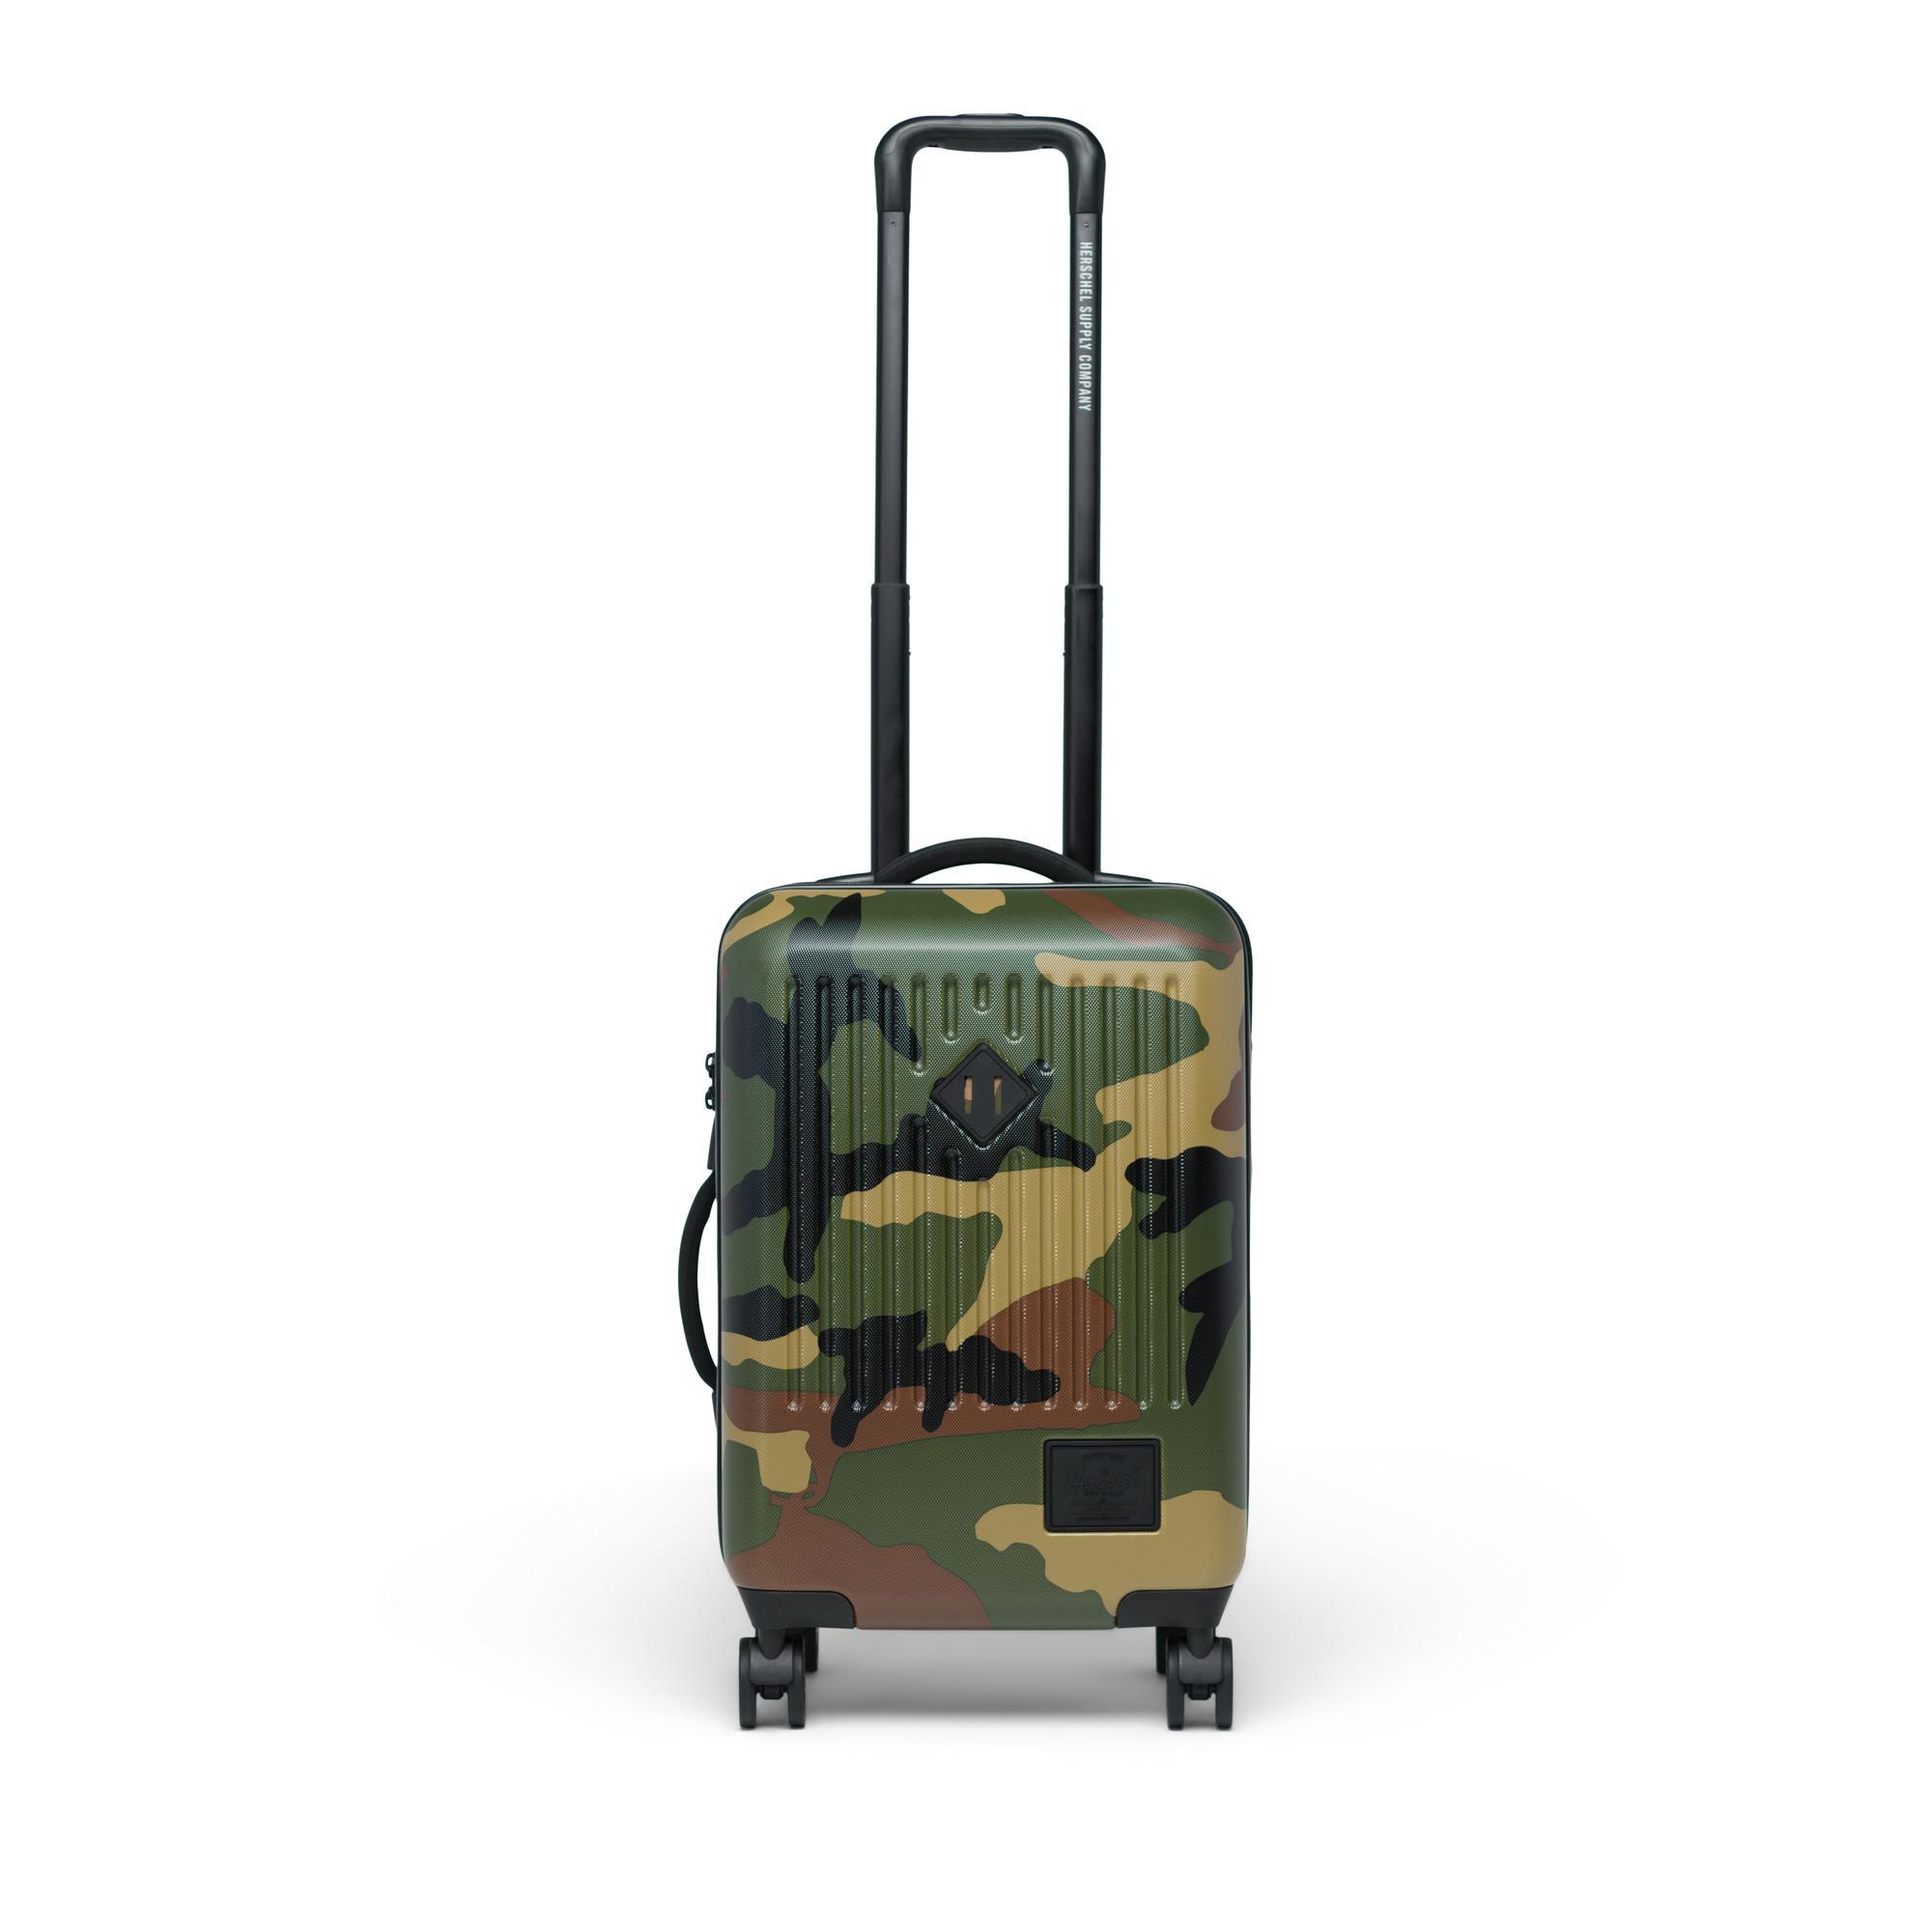 eb197f044425 Trade Luggage Small | Herschel Supply Company